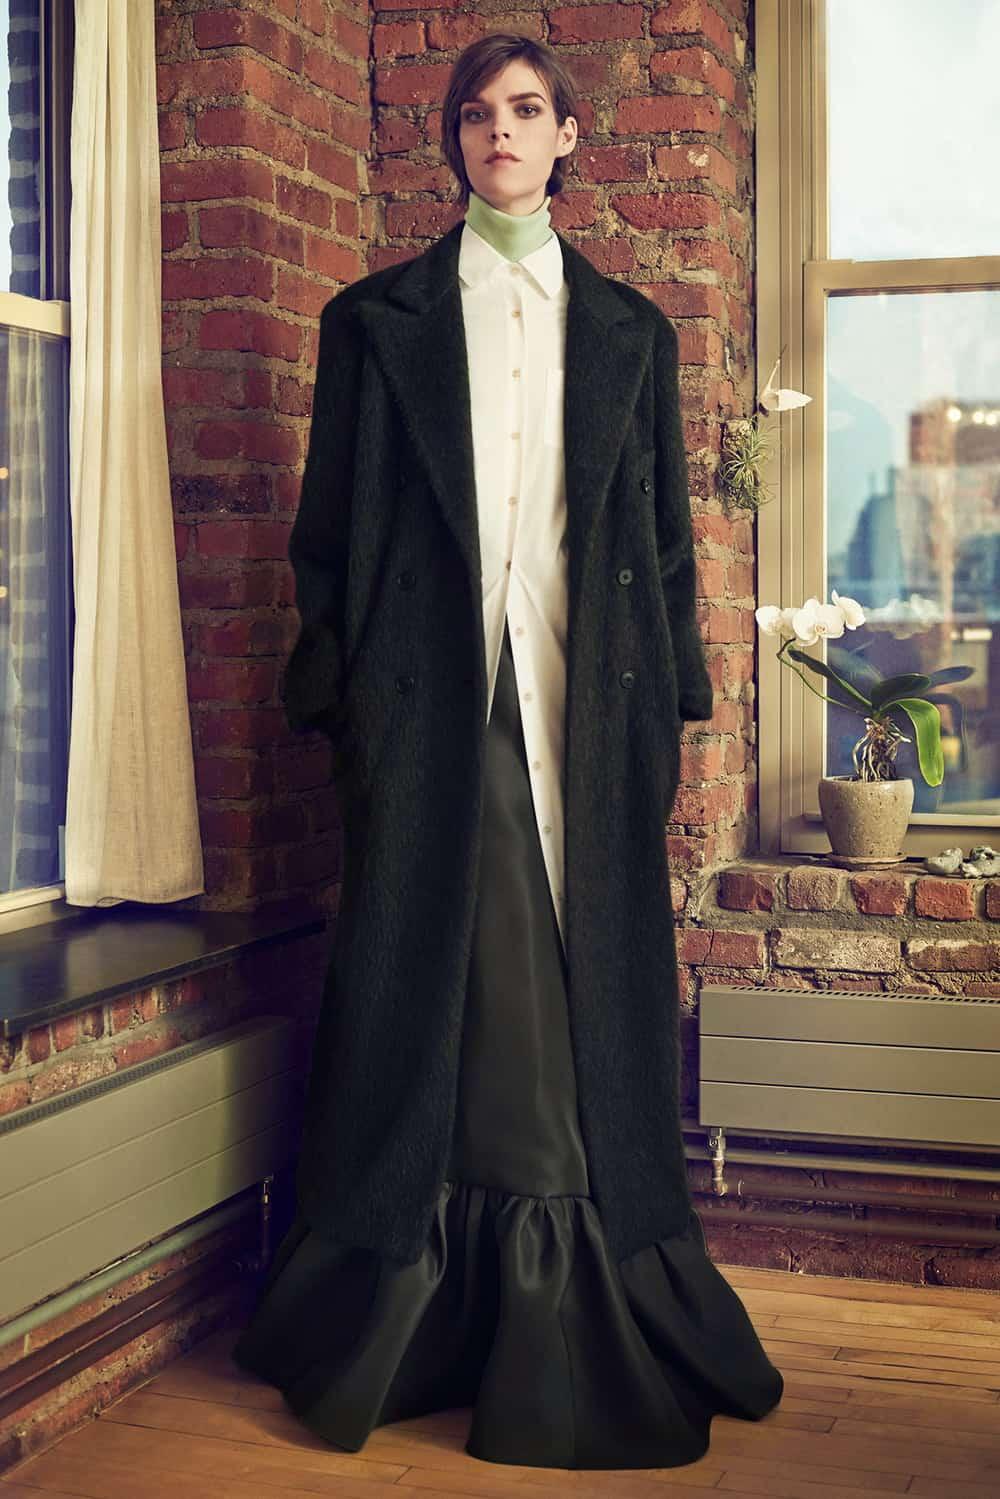 Trends autumn winter 2017 - Maxi Winter Coats Tradingbasis